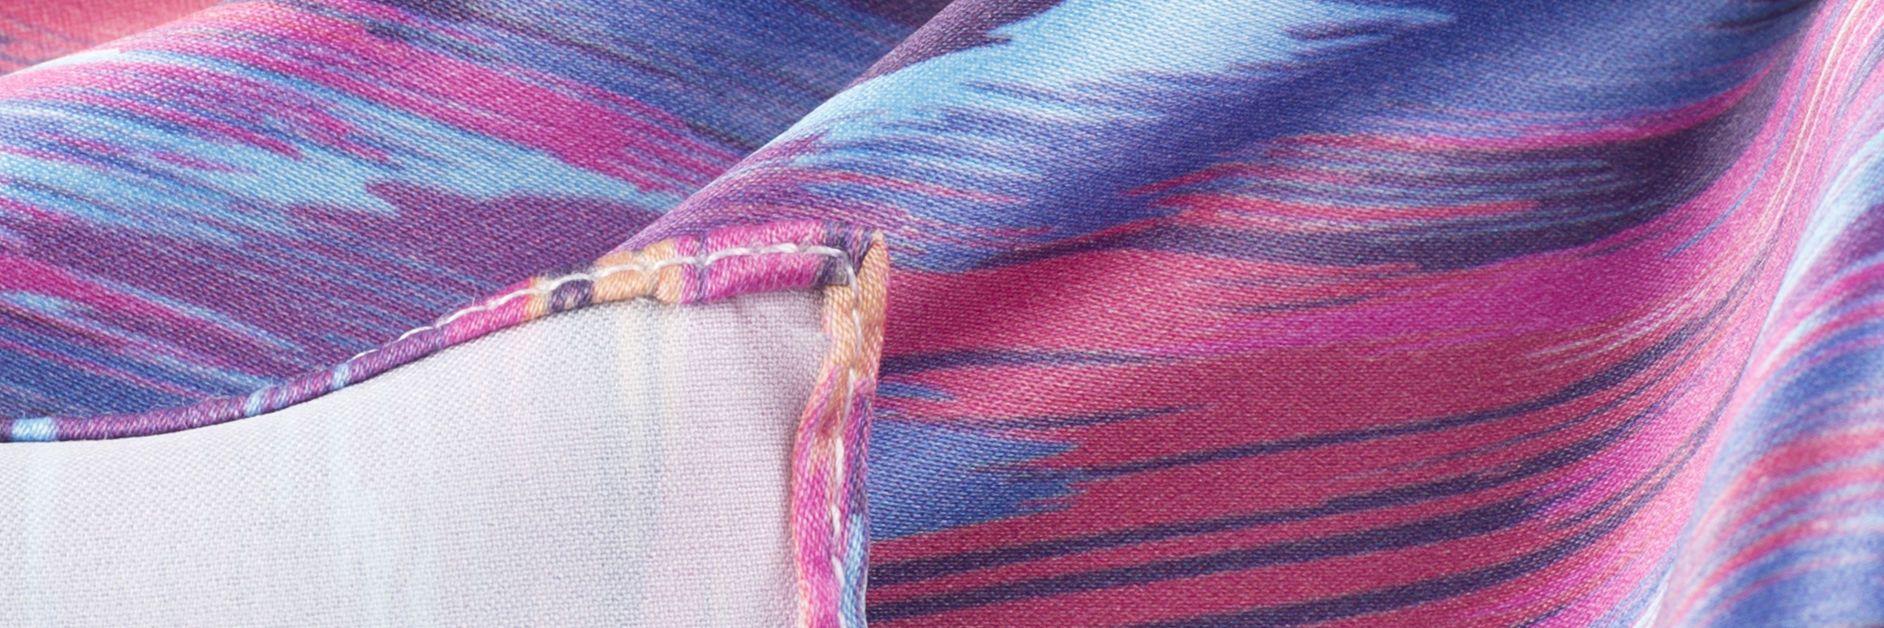 tela de seda para pañuelos